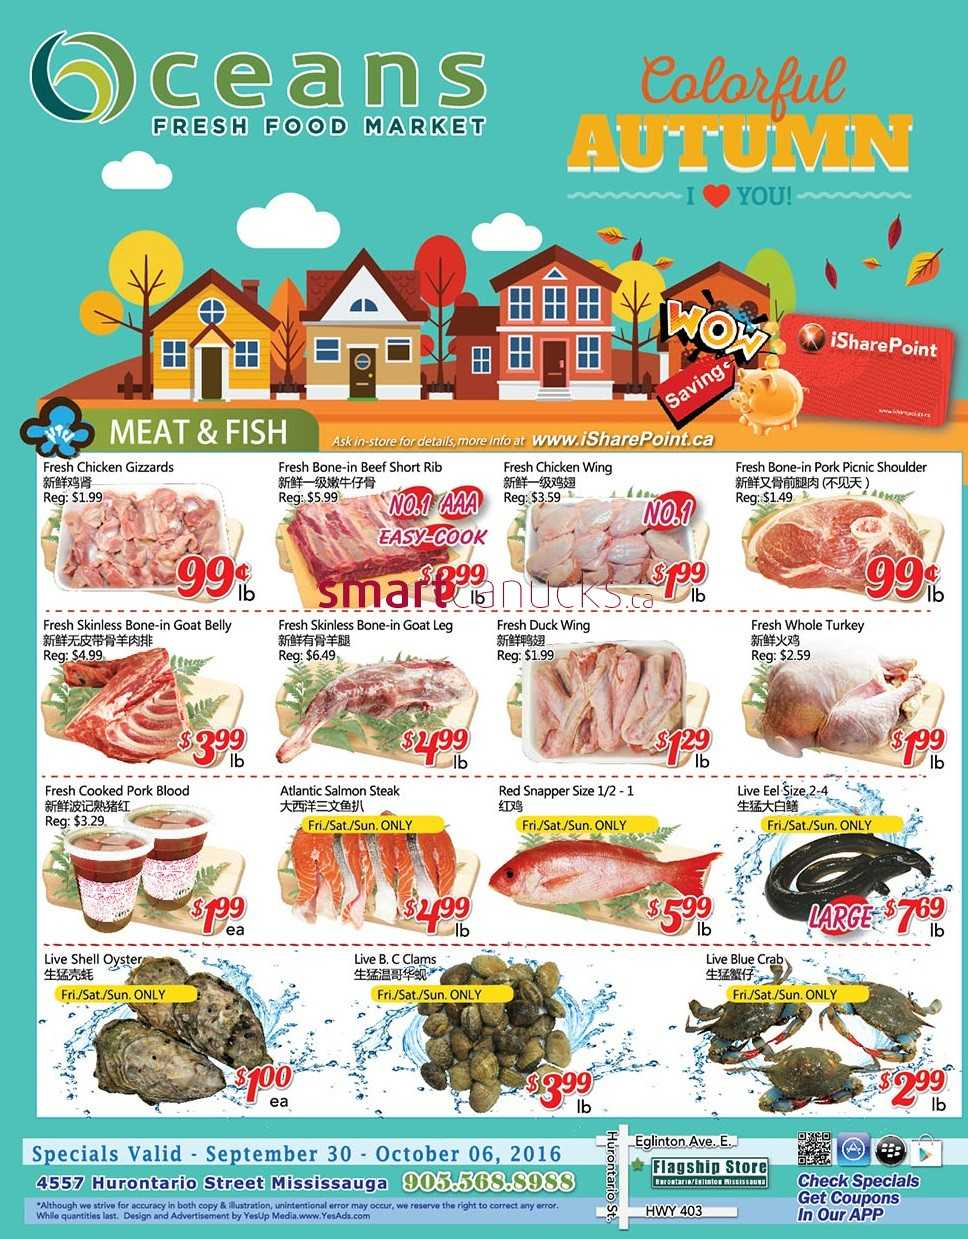 Fresh Food Market 6 October